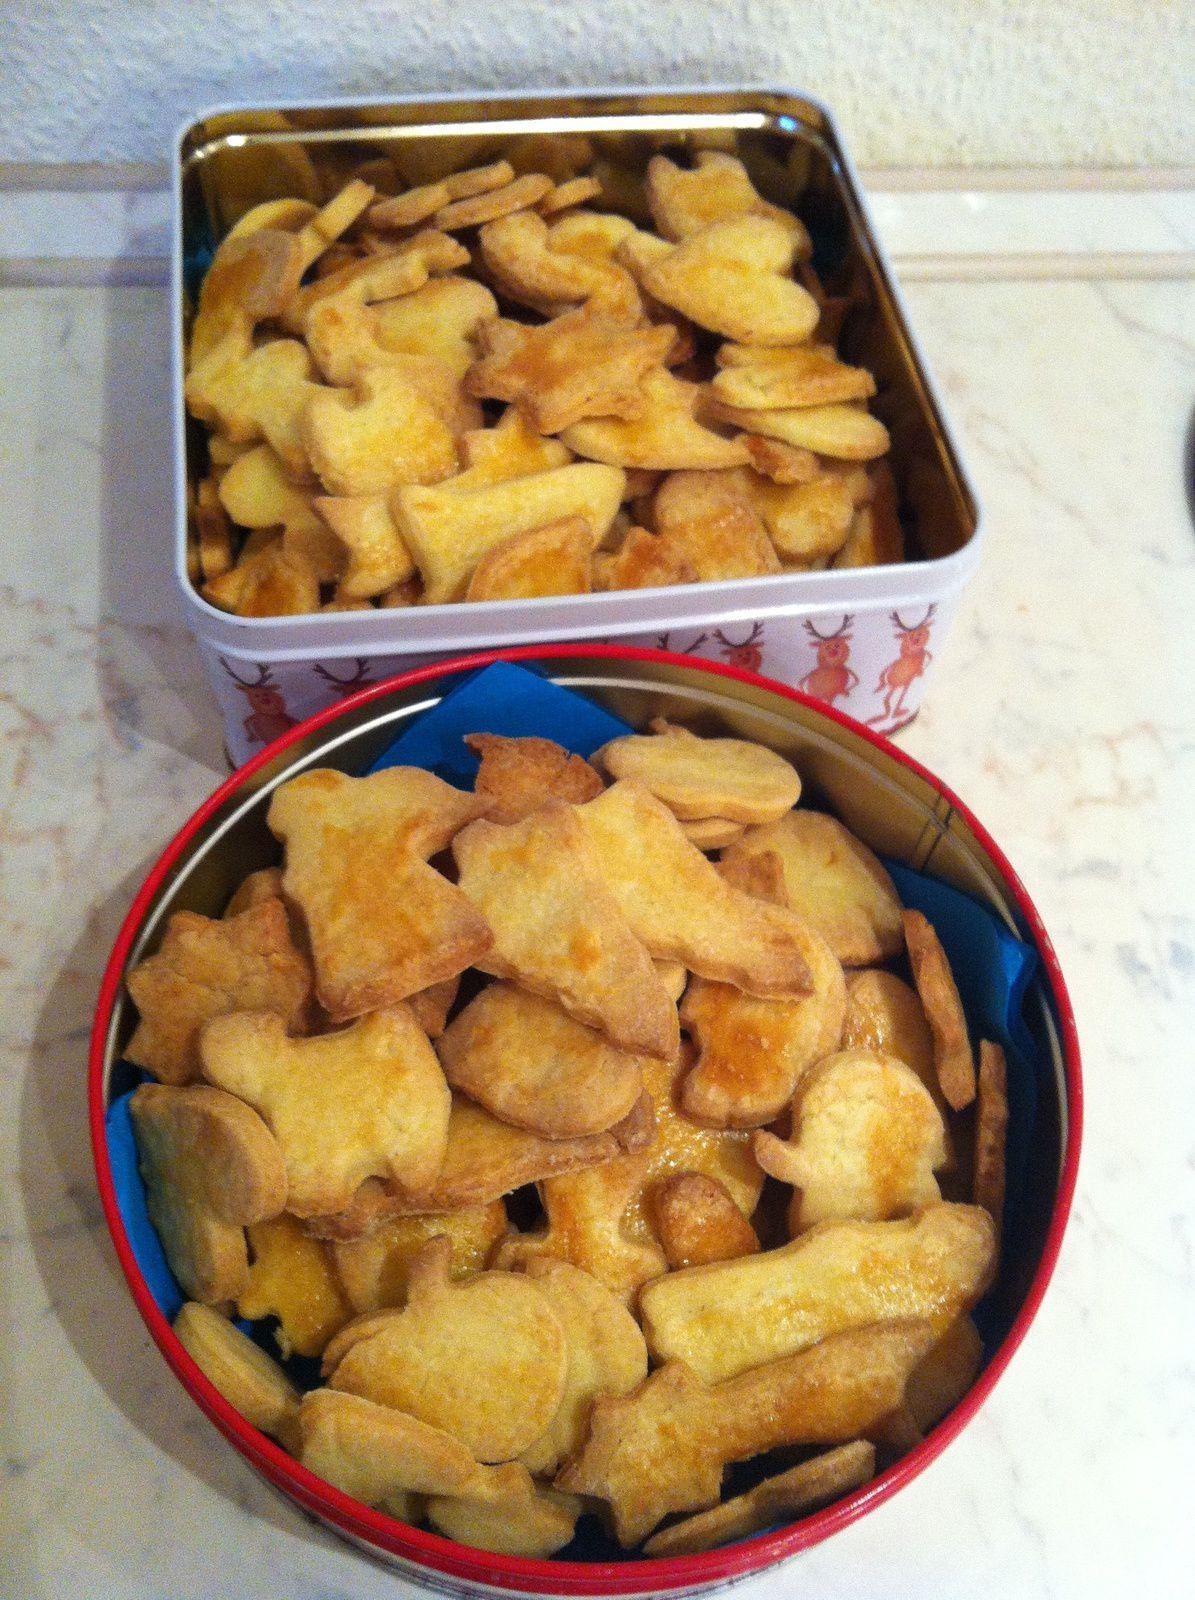 butterbredeles (petits fours au beurre)